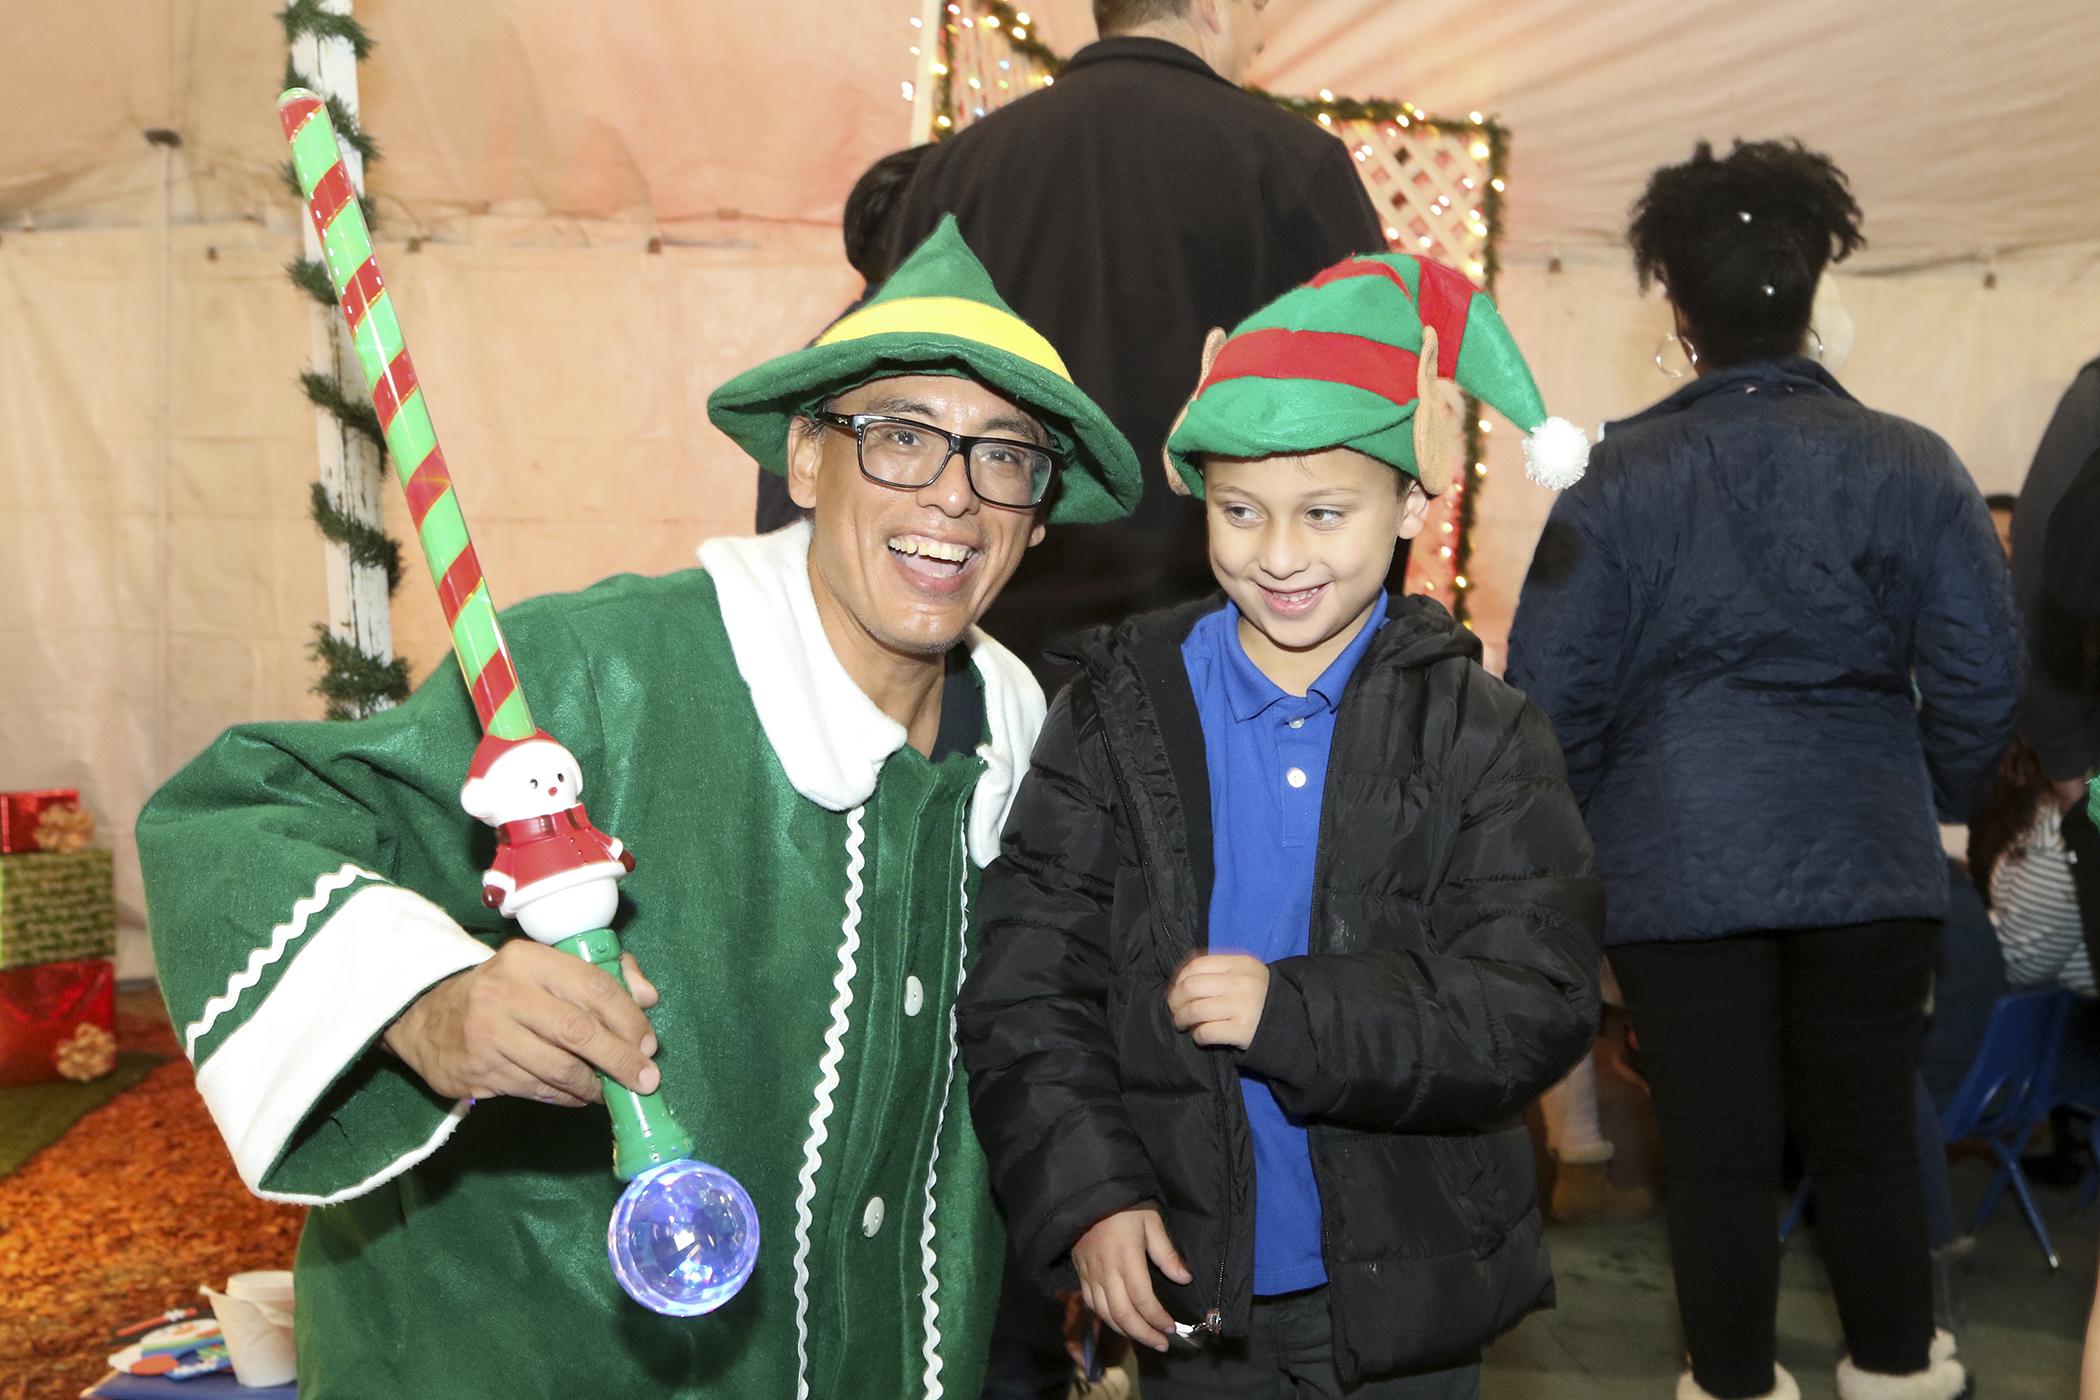 KCSOS Holiday Party 2019 held at CALM